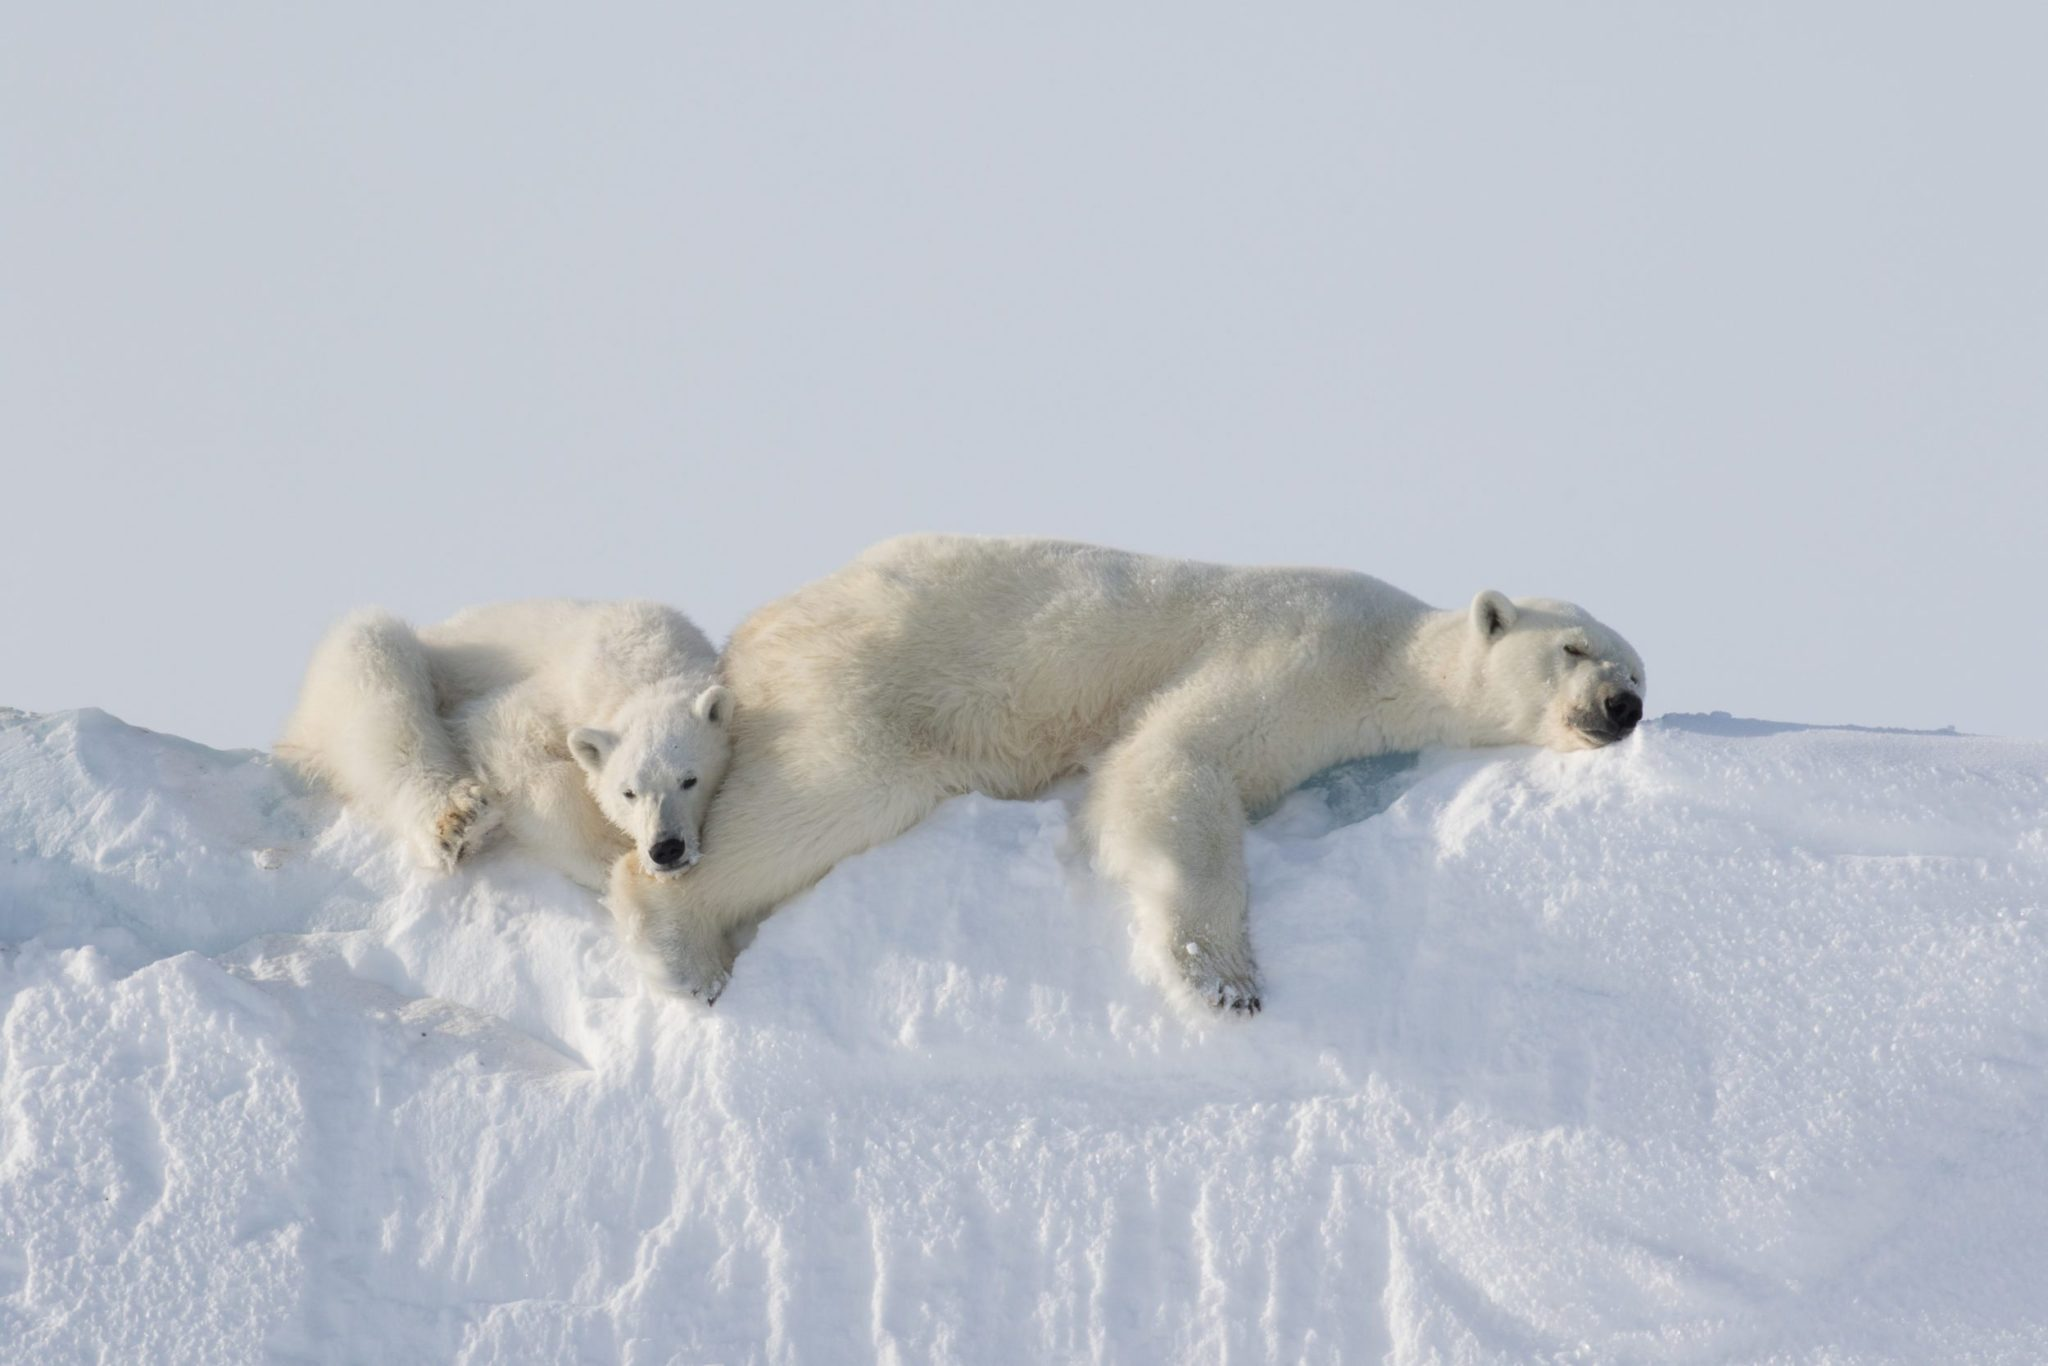 Spring Cubs & Polar Bears on Icebergs: Baffin Island   Arctic Kingdom